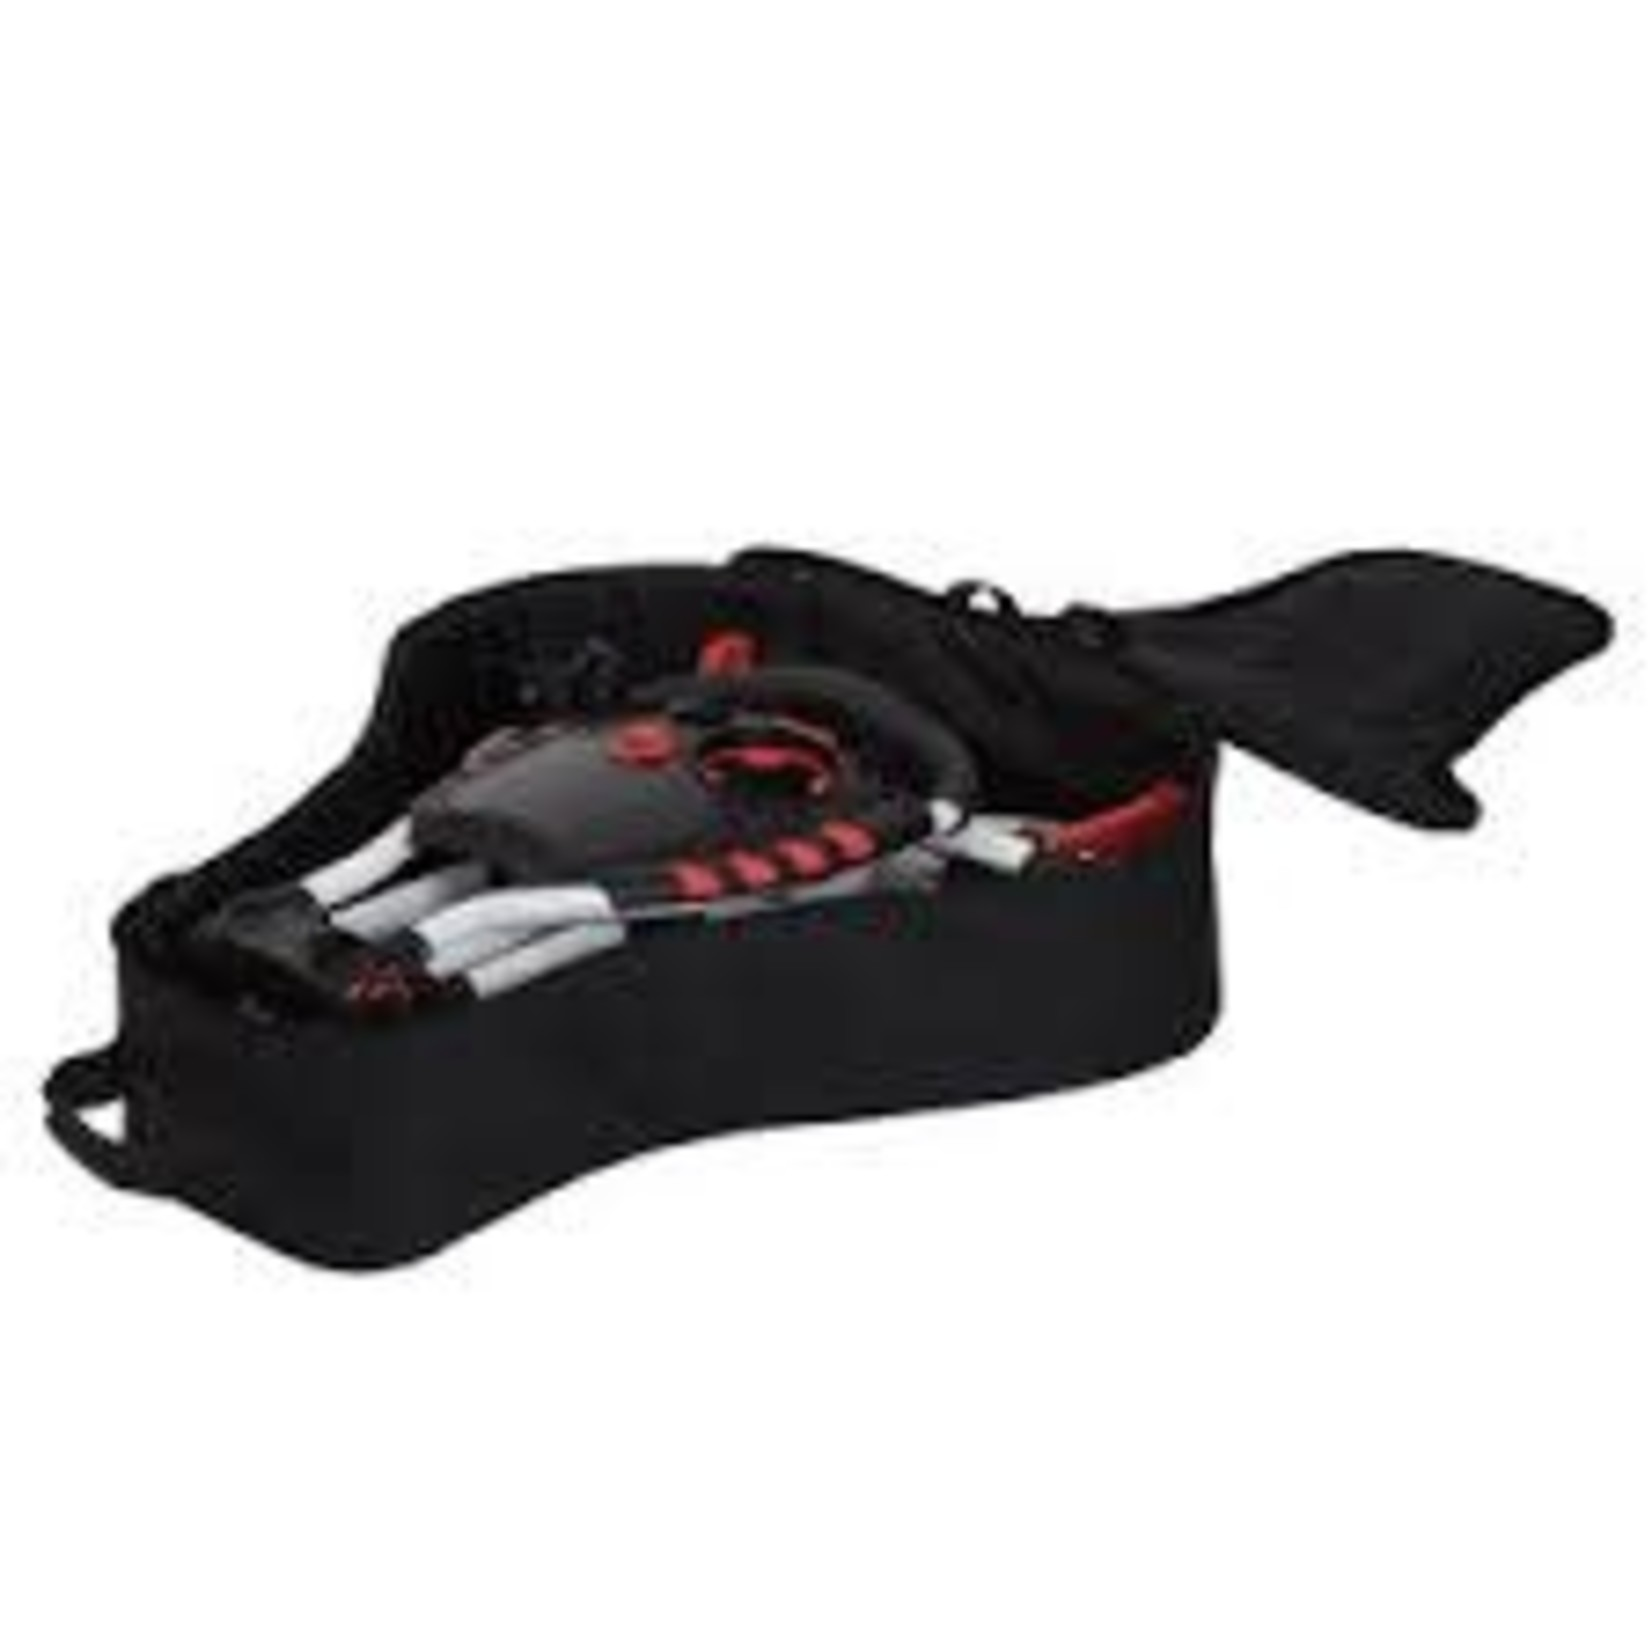 FastFold FastFold Flat Transport Bag